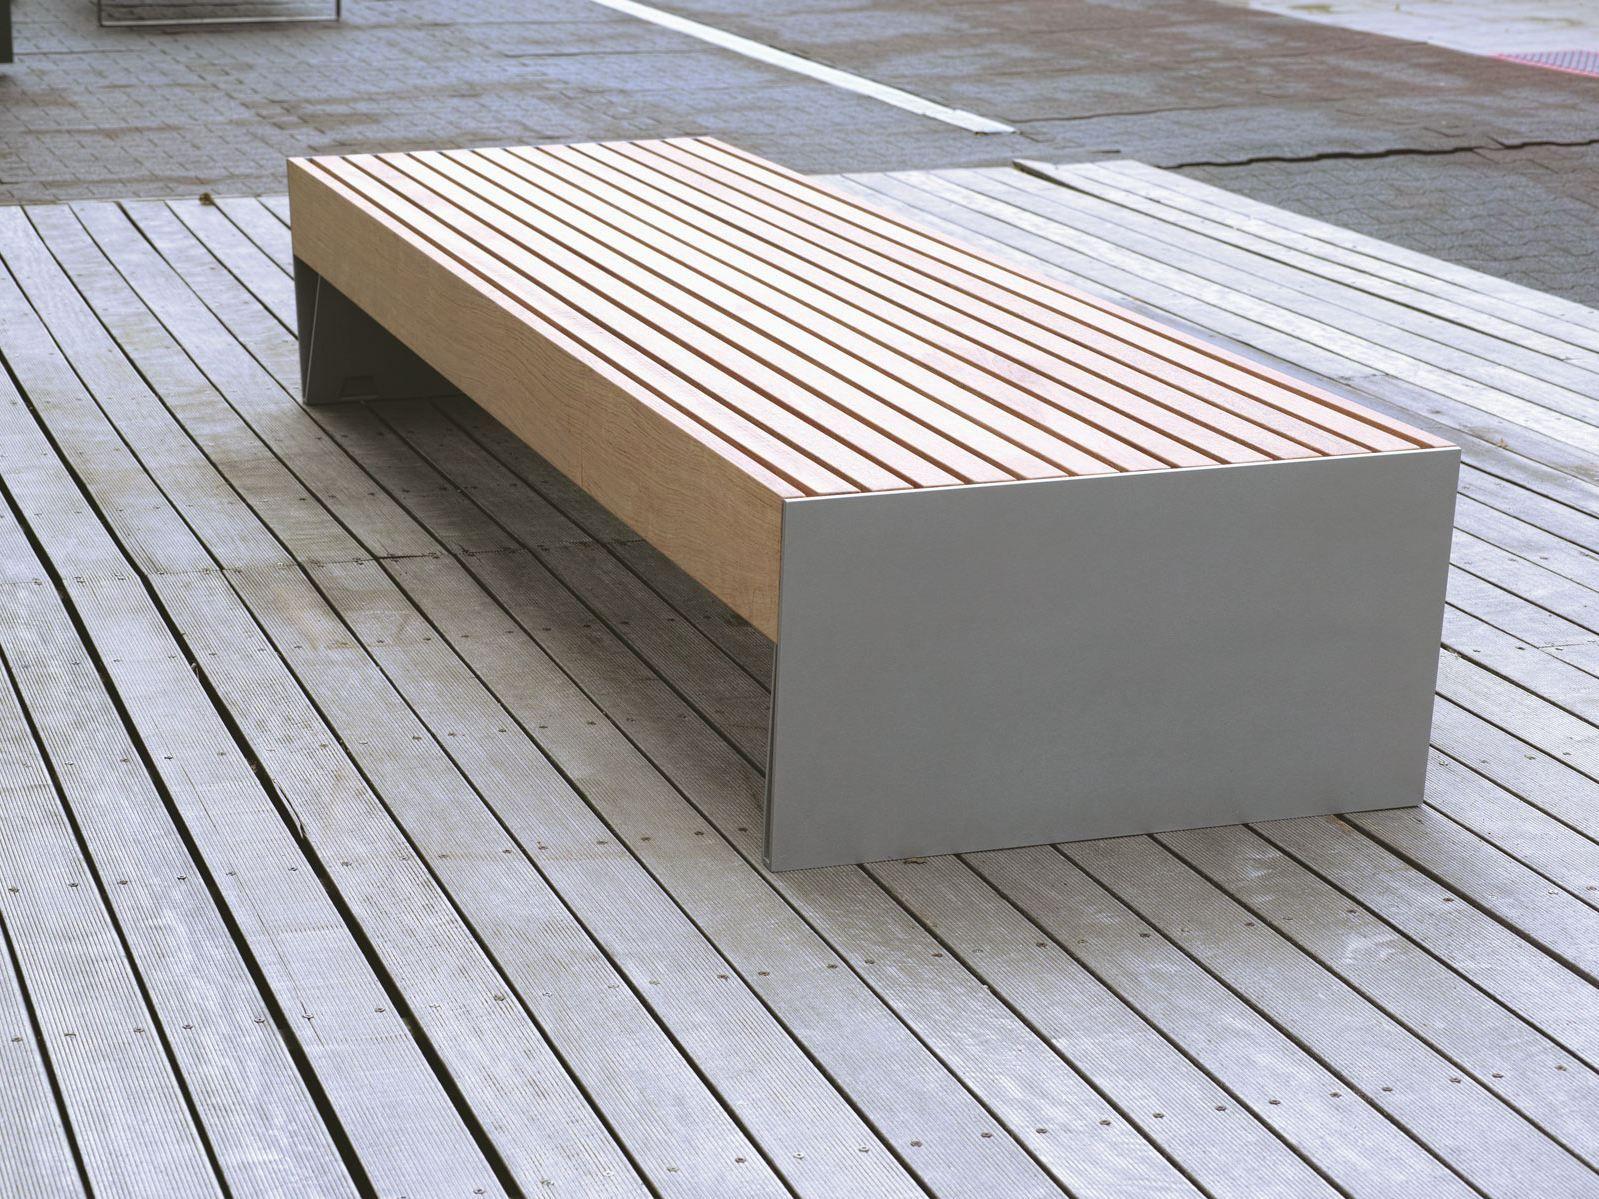 Bank ohne Rückenlehne BLOCQ by mmcité 1 | Design David Karásek ...